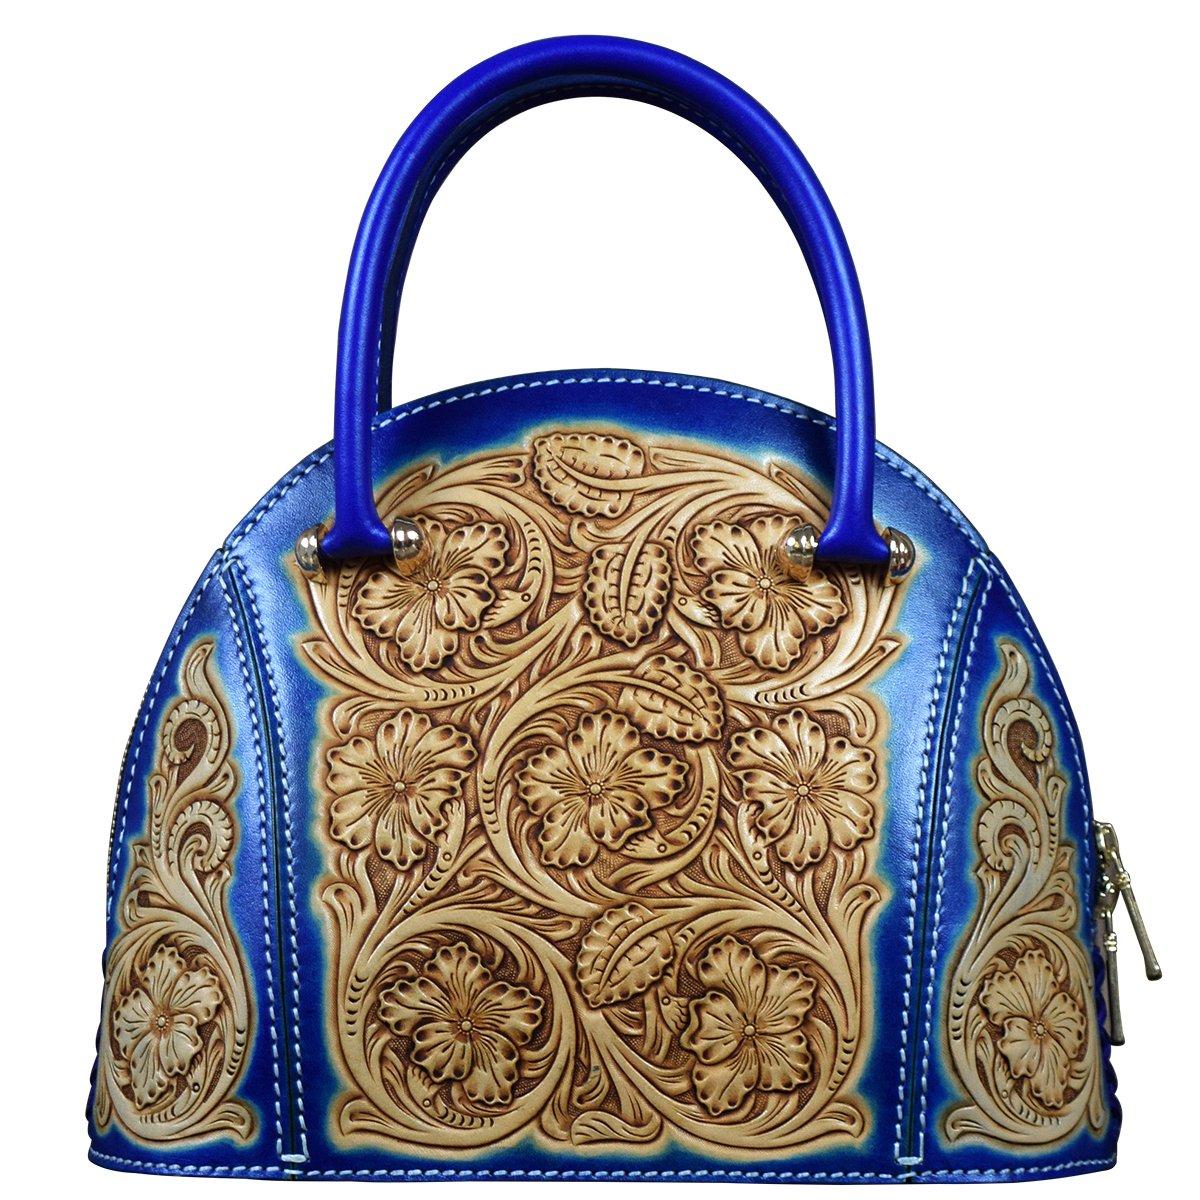 OLG.YAT Vegetable Tanned Leather Lady Handbags Retro Little Bow Leisure Purse HKBH-3